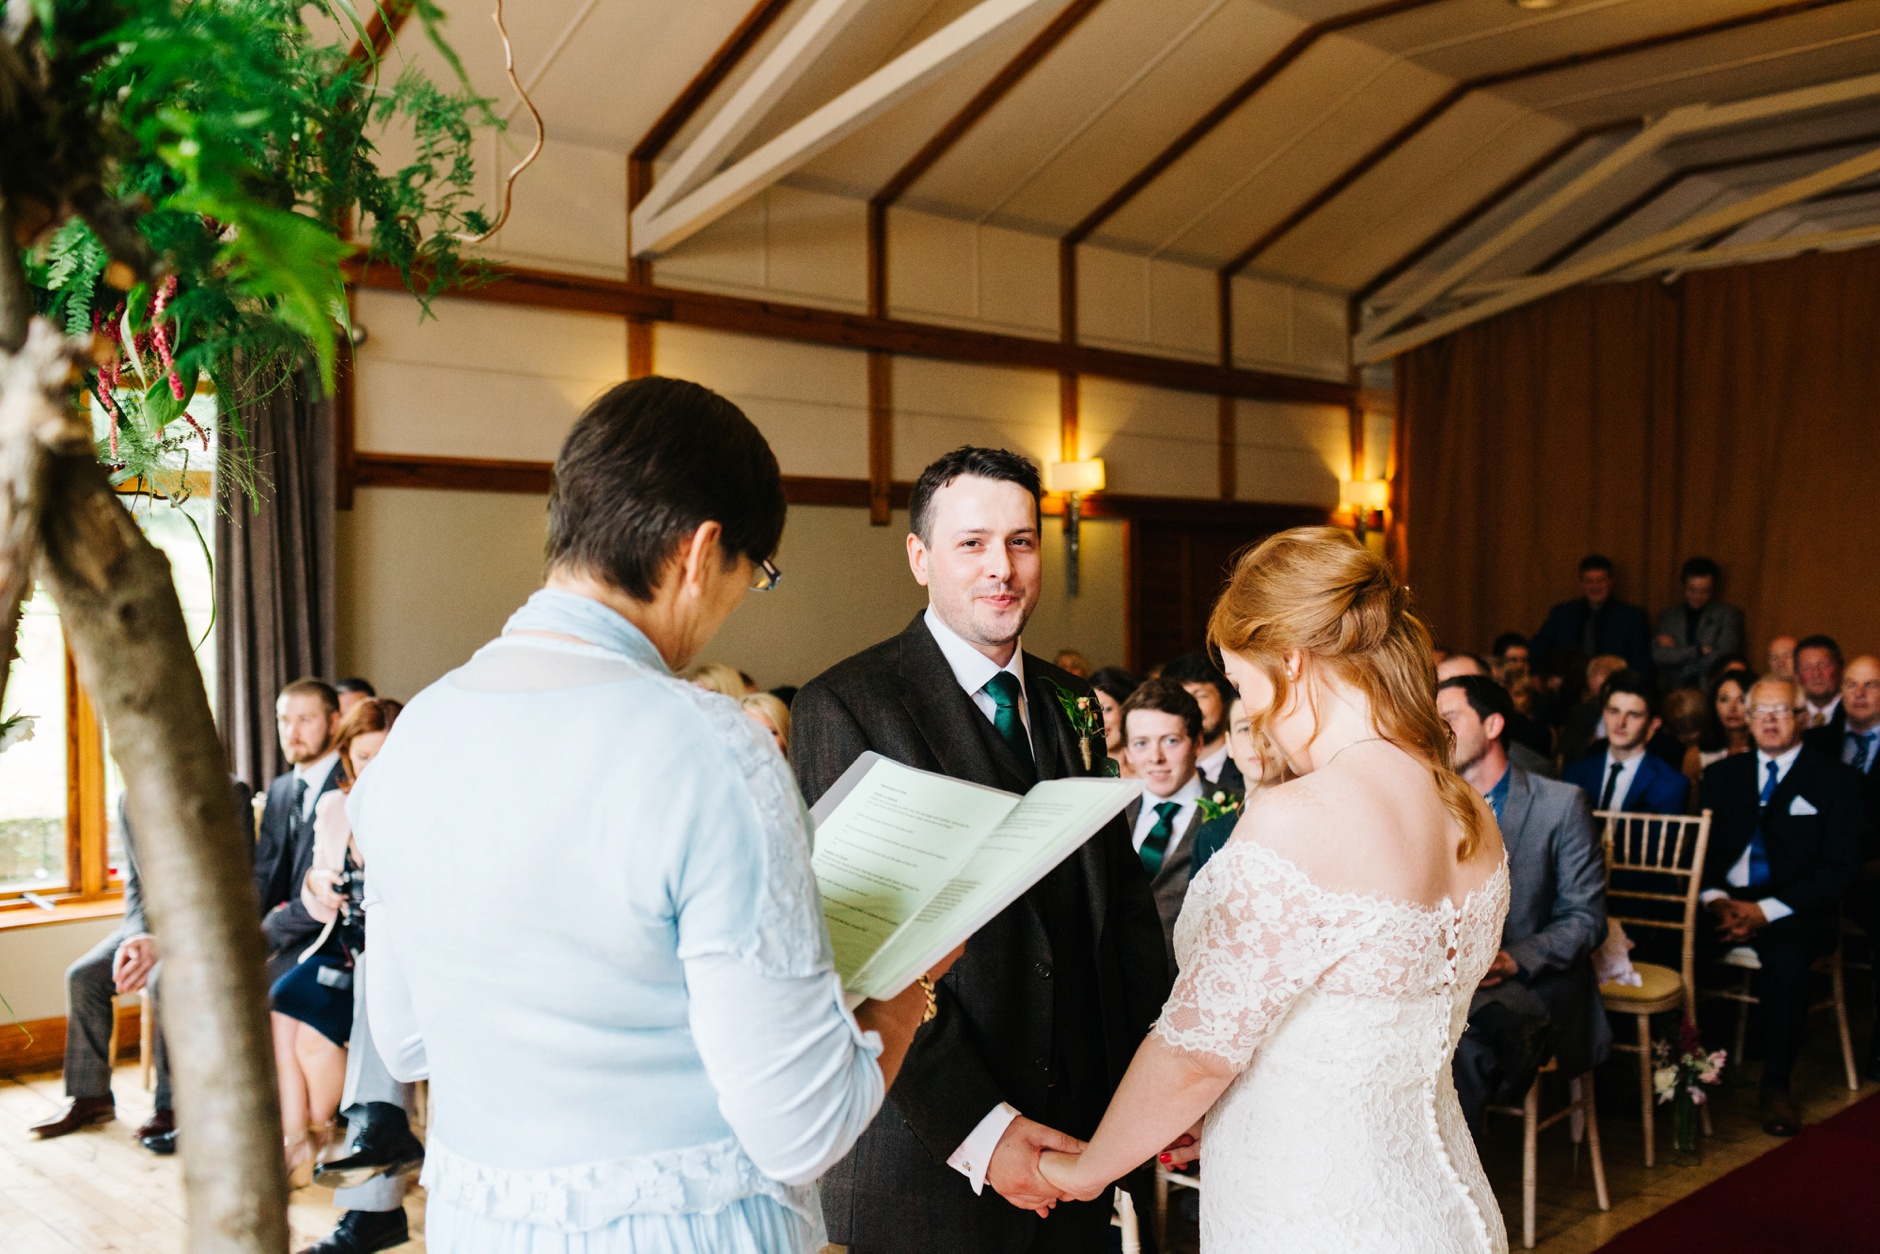 humanist wedding ceremony wedding photographer northern ireland